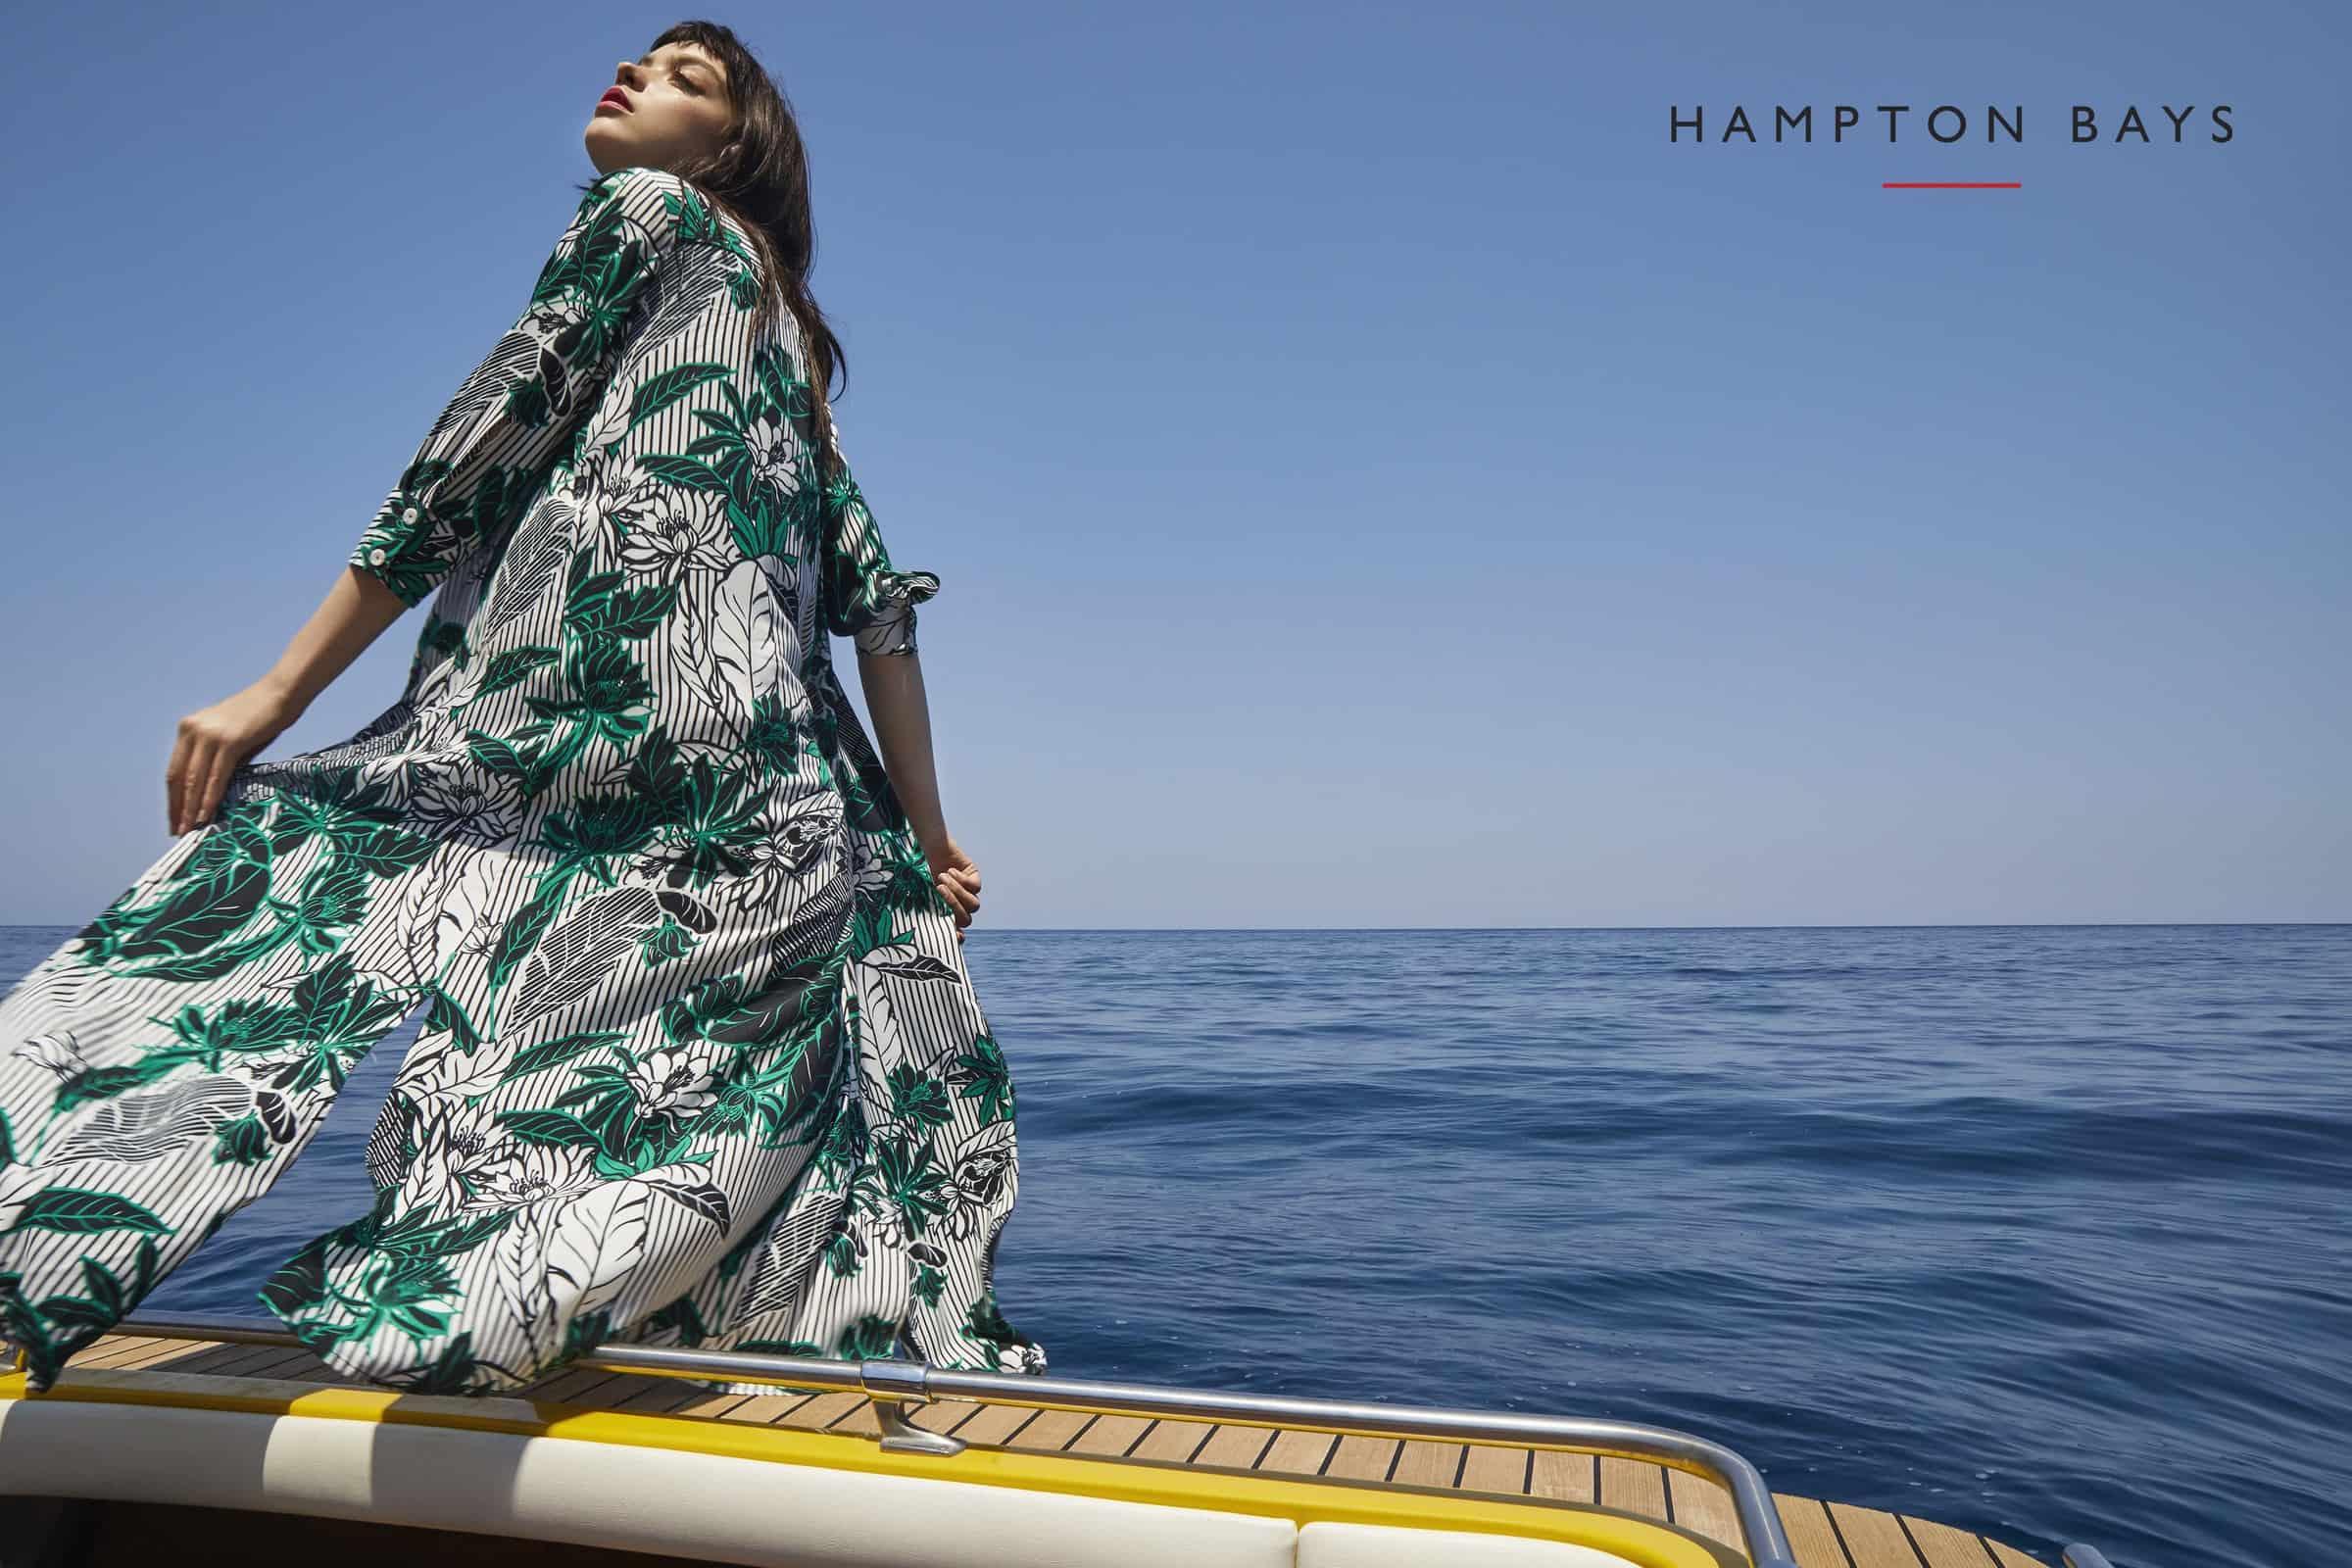 HAMPTON BAYS ZOMER 2019 NR2